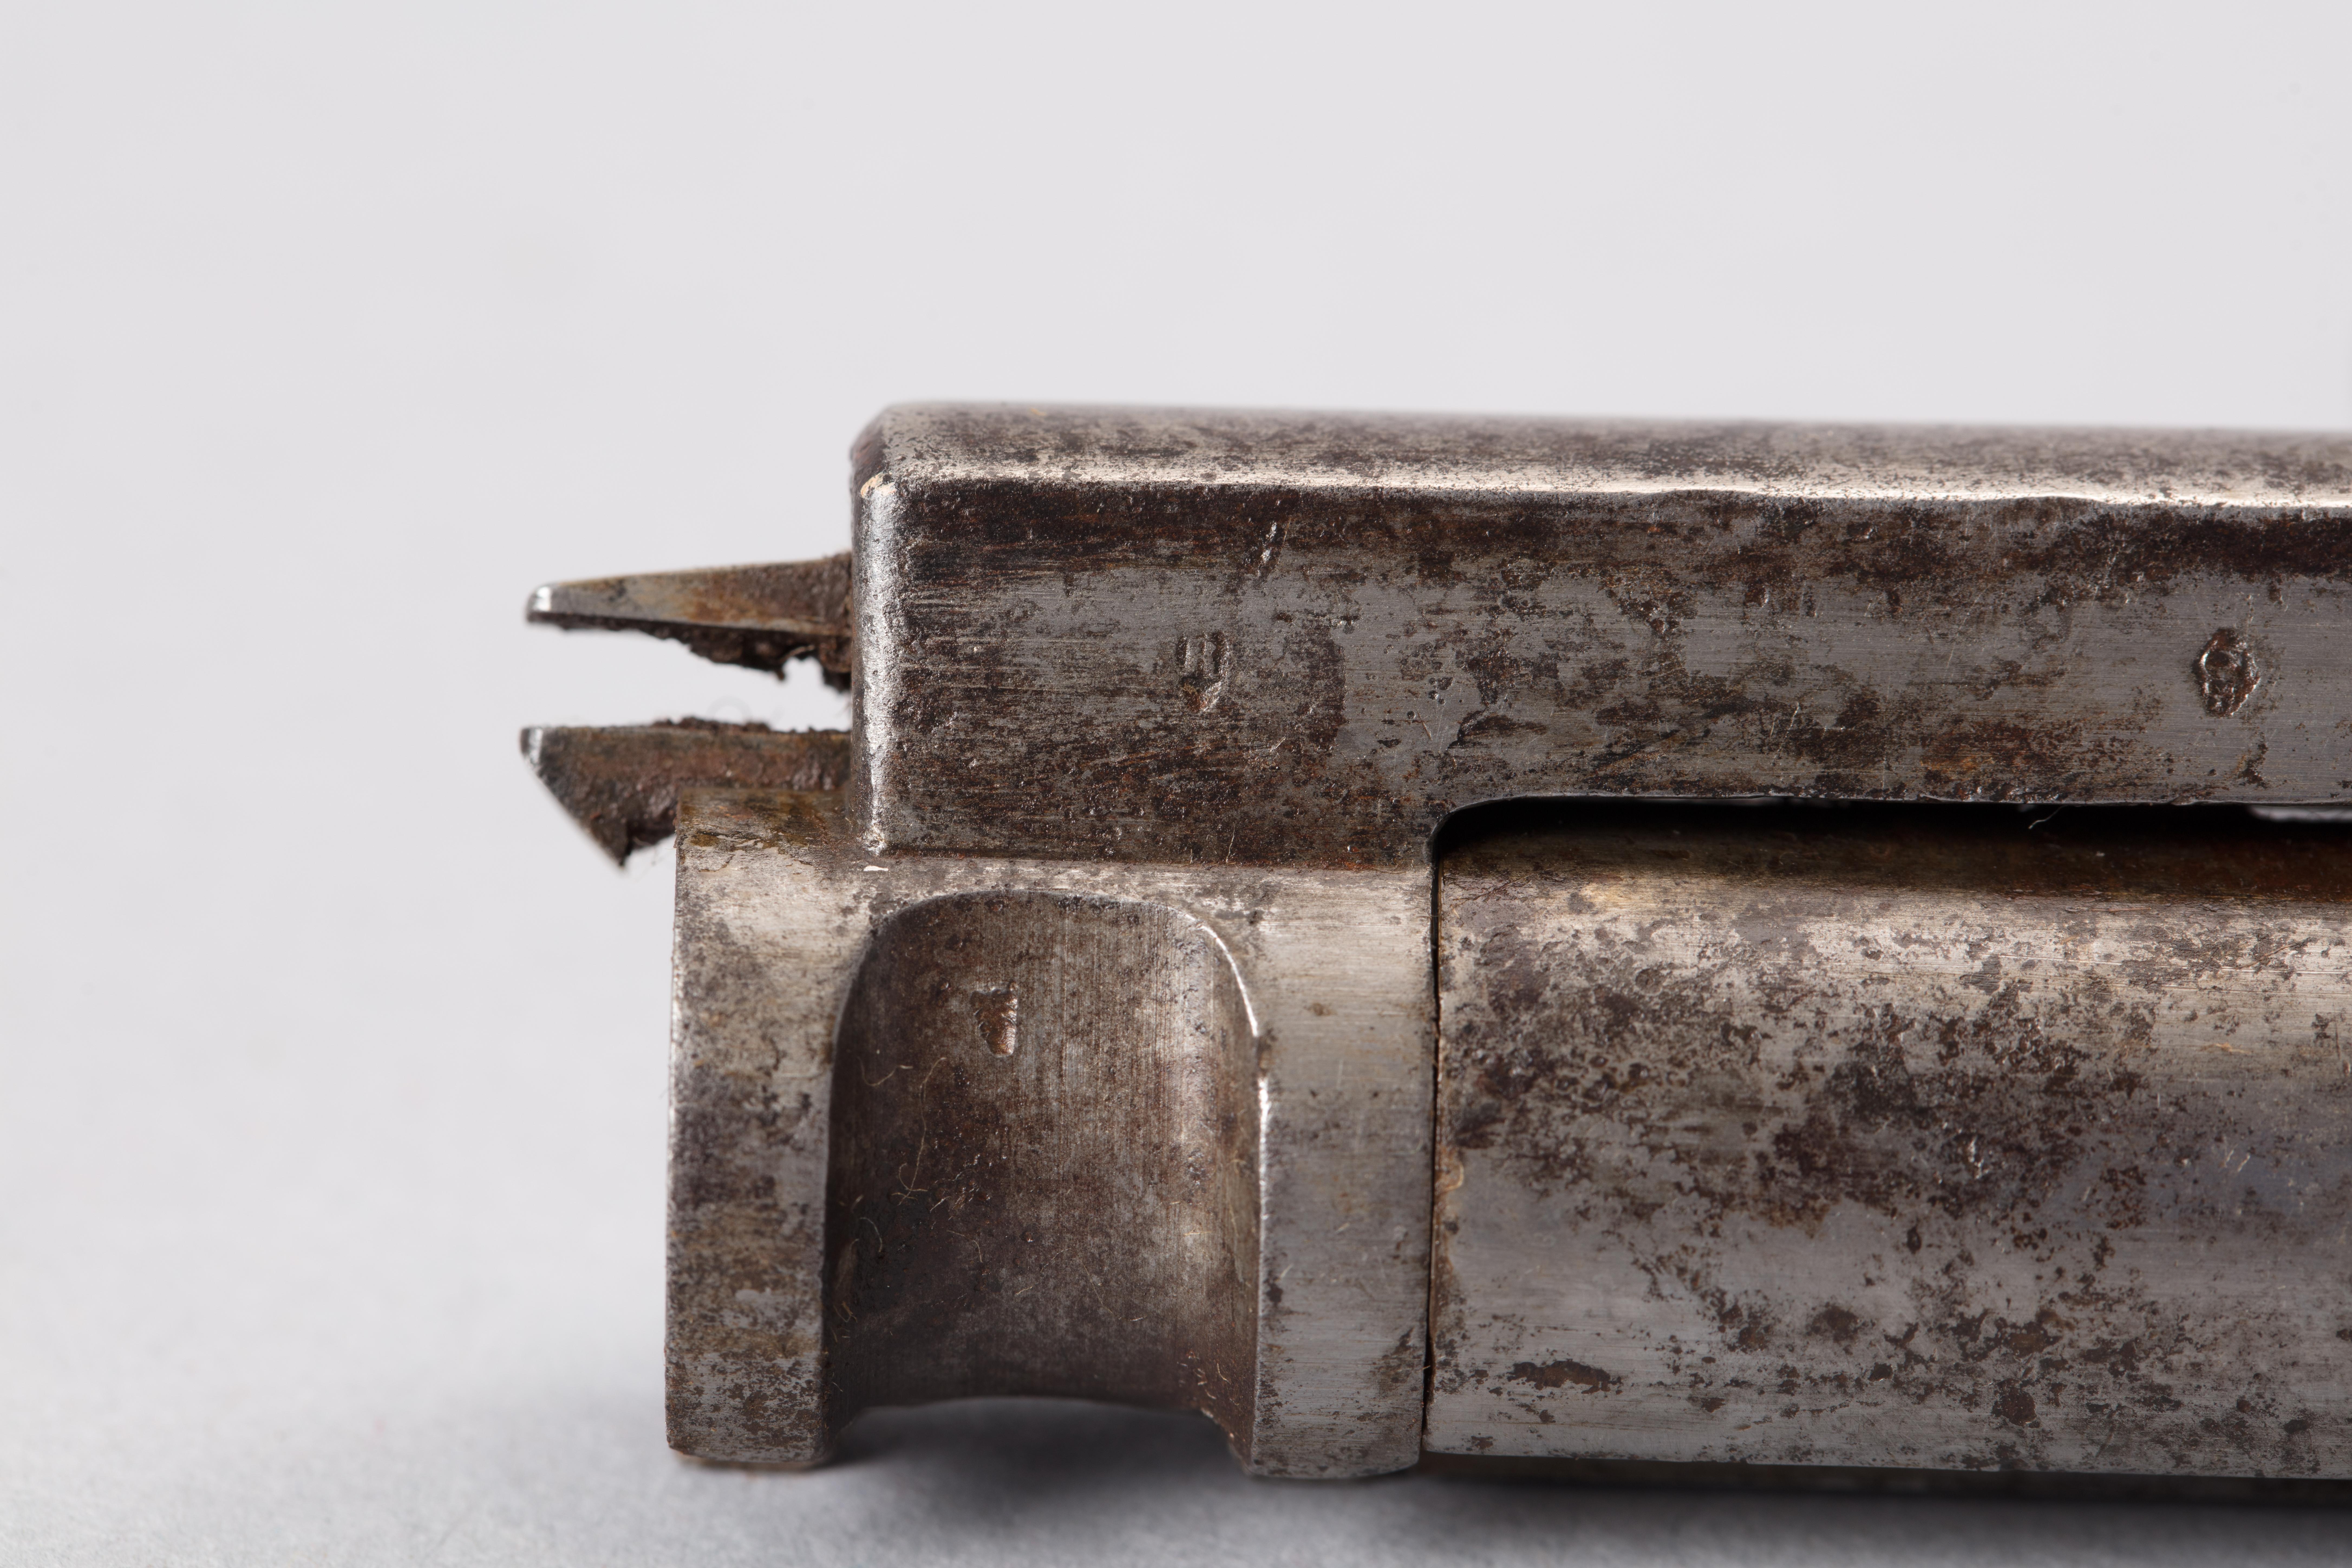 carbine, bolt action - Collections Online - Auckland War